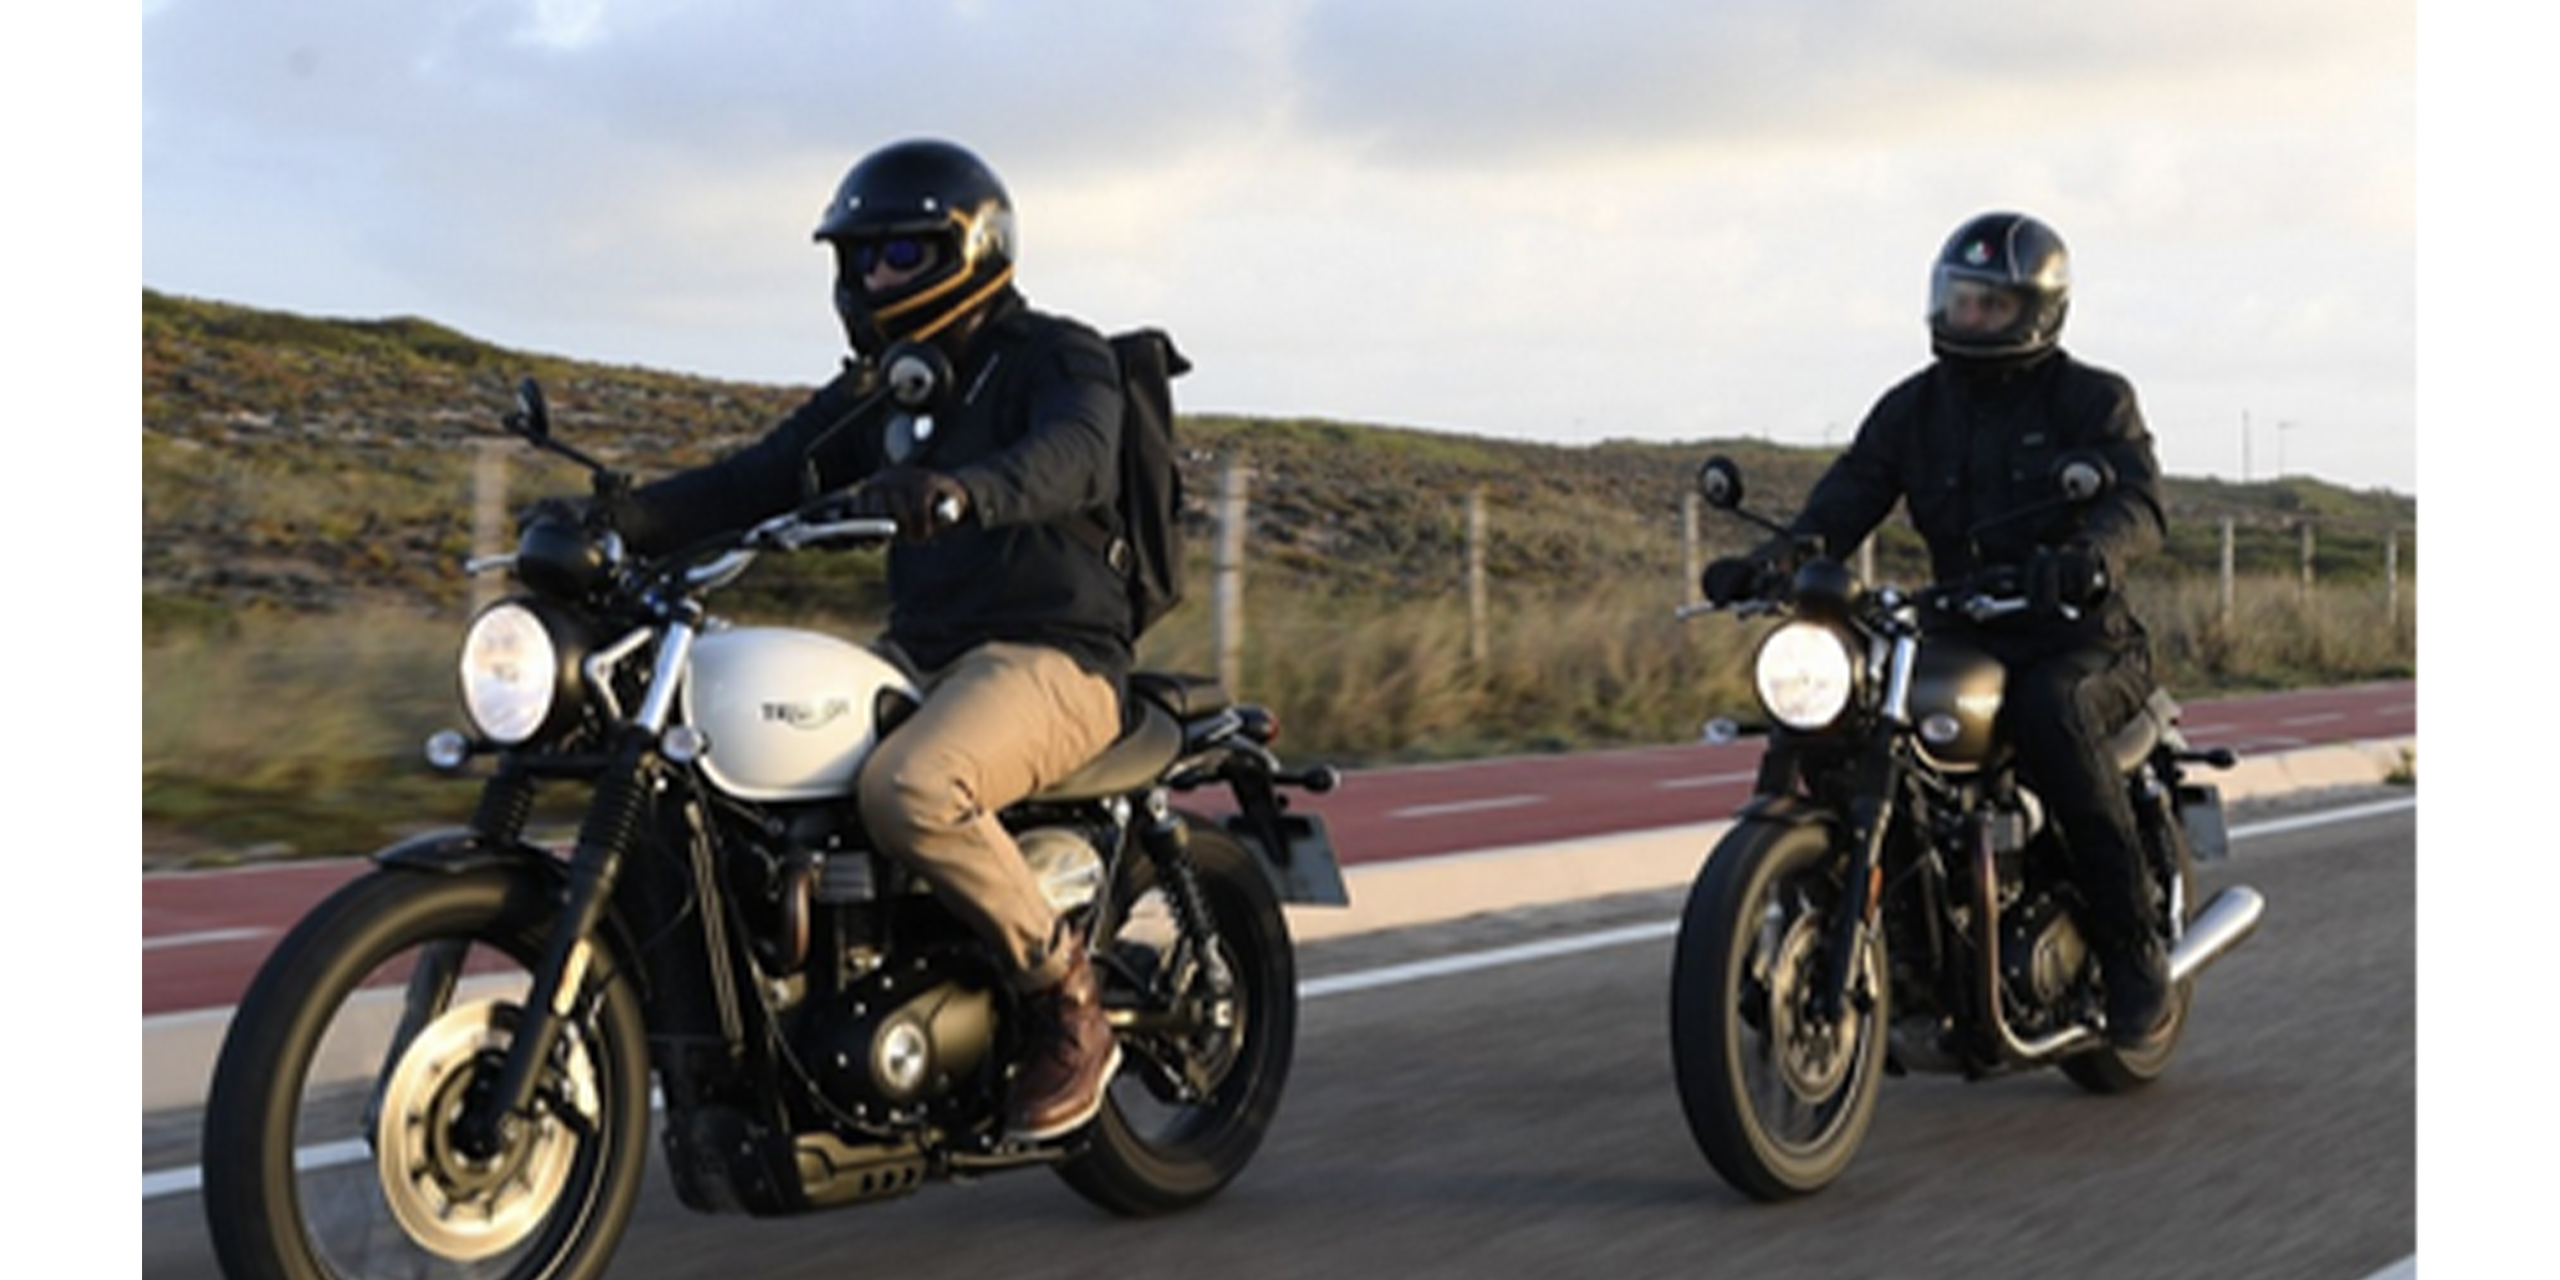 Best Motorcycles Under $10,000